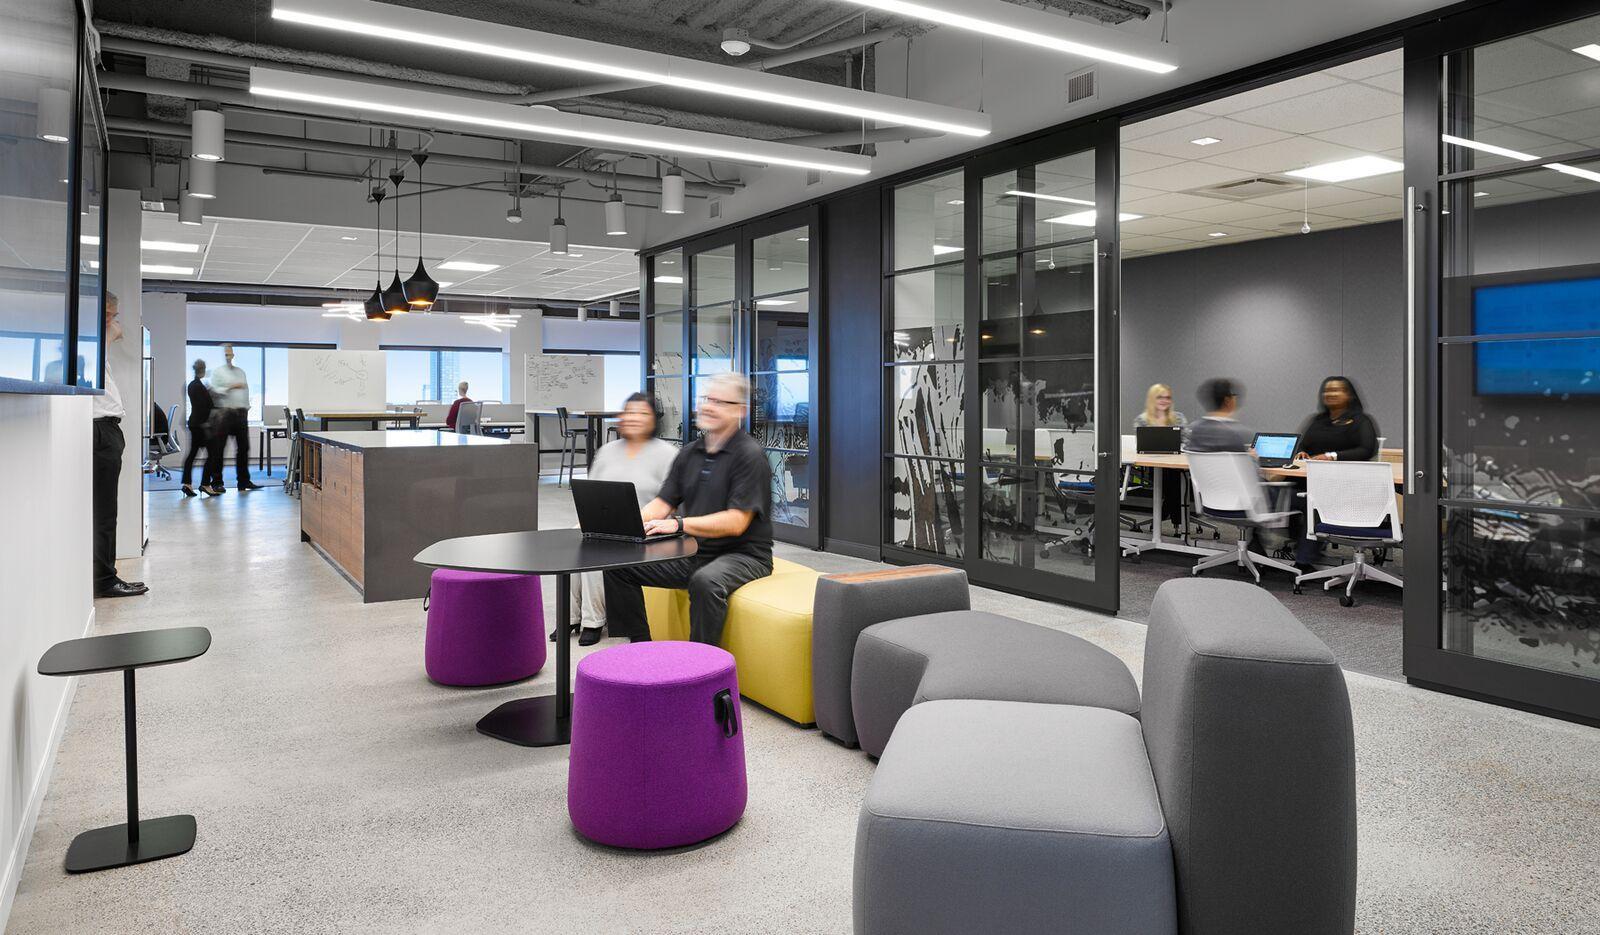 Aviva digital garage design source guide office space